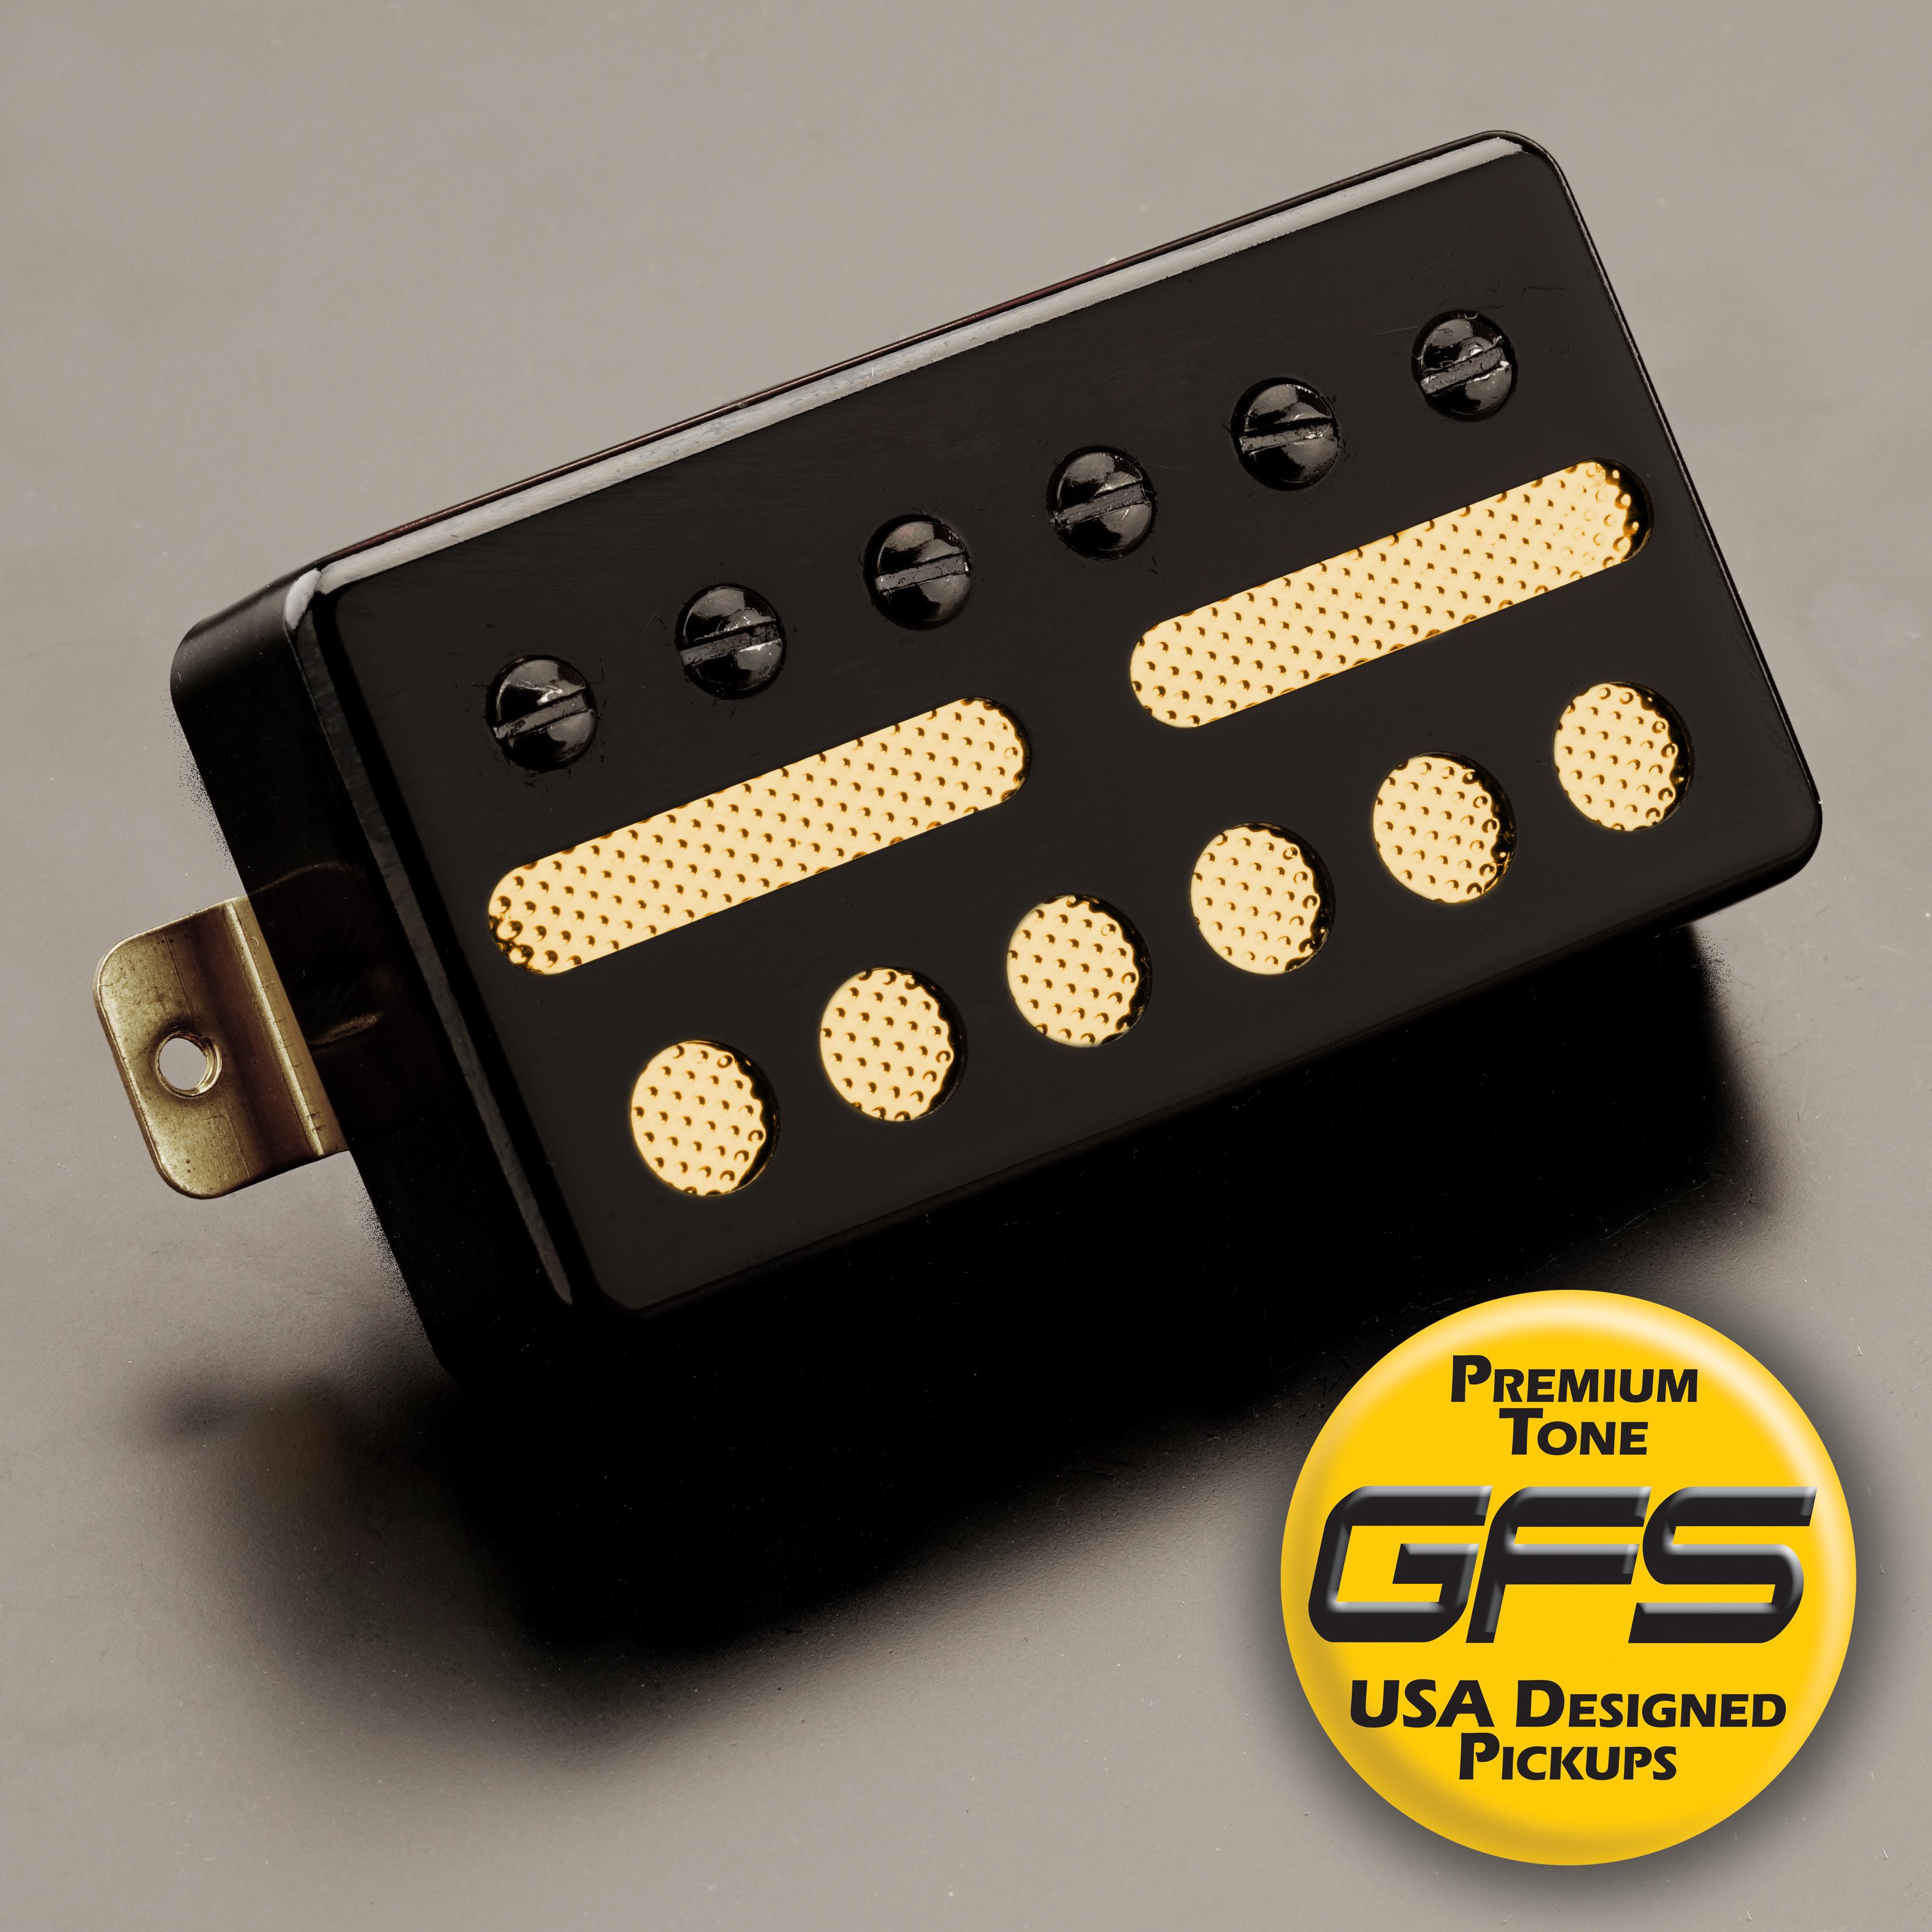 Black_KPH155_1 kp gfs gold foil humbucker alnico v, black kwikplug™ ready gfs humbucker wiring diagram at n-0.co